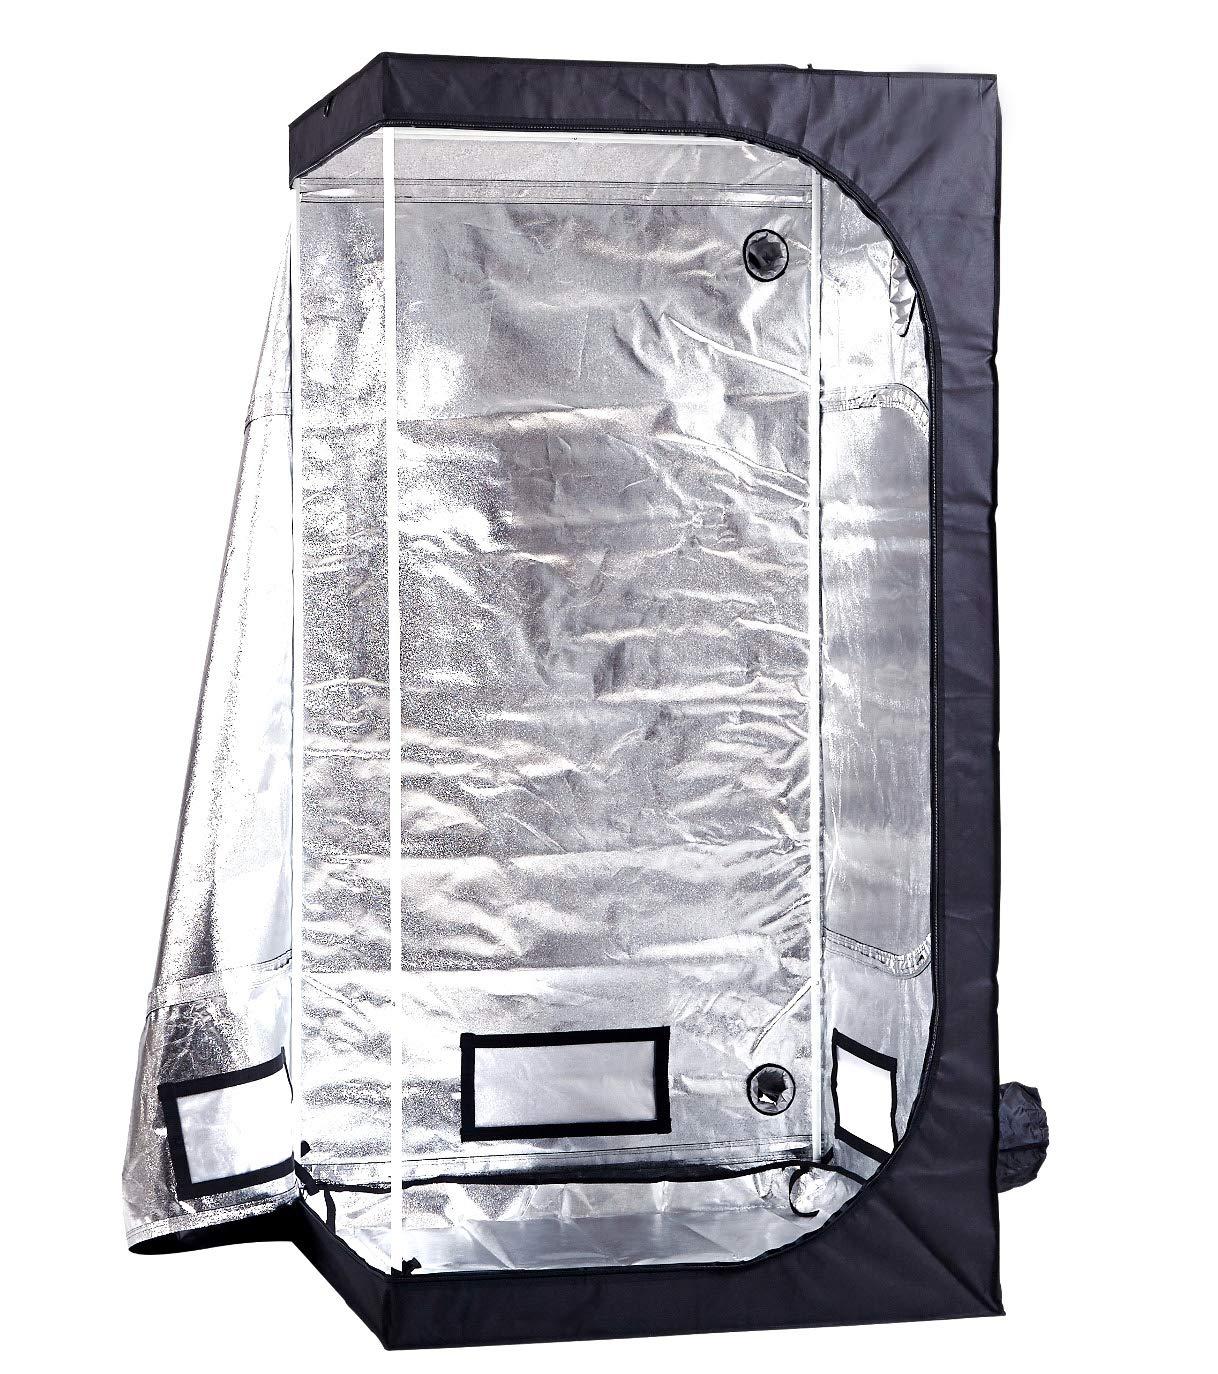 100 x 100 x 200cm GE Original Premium Grow Box HQ Greenhouse Plant Tent for Indoor Use